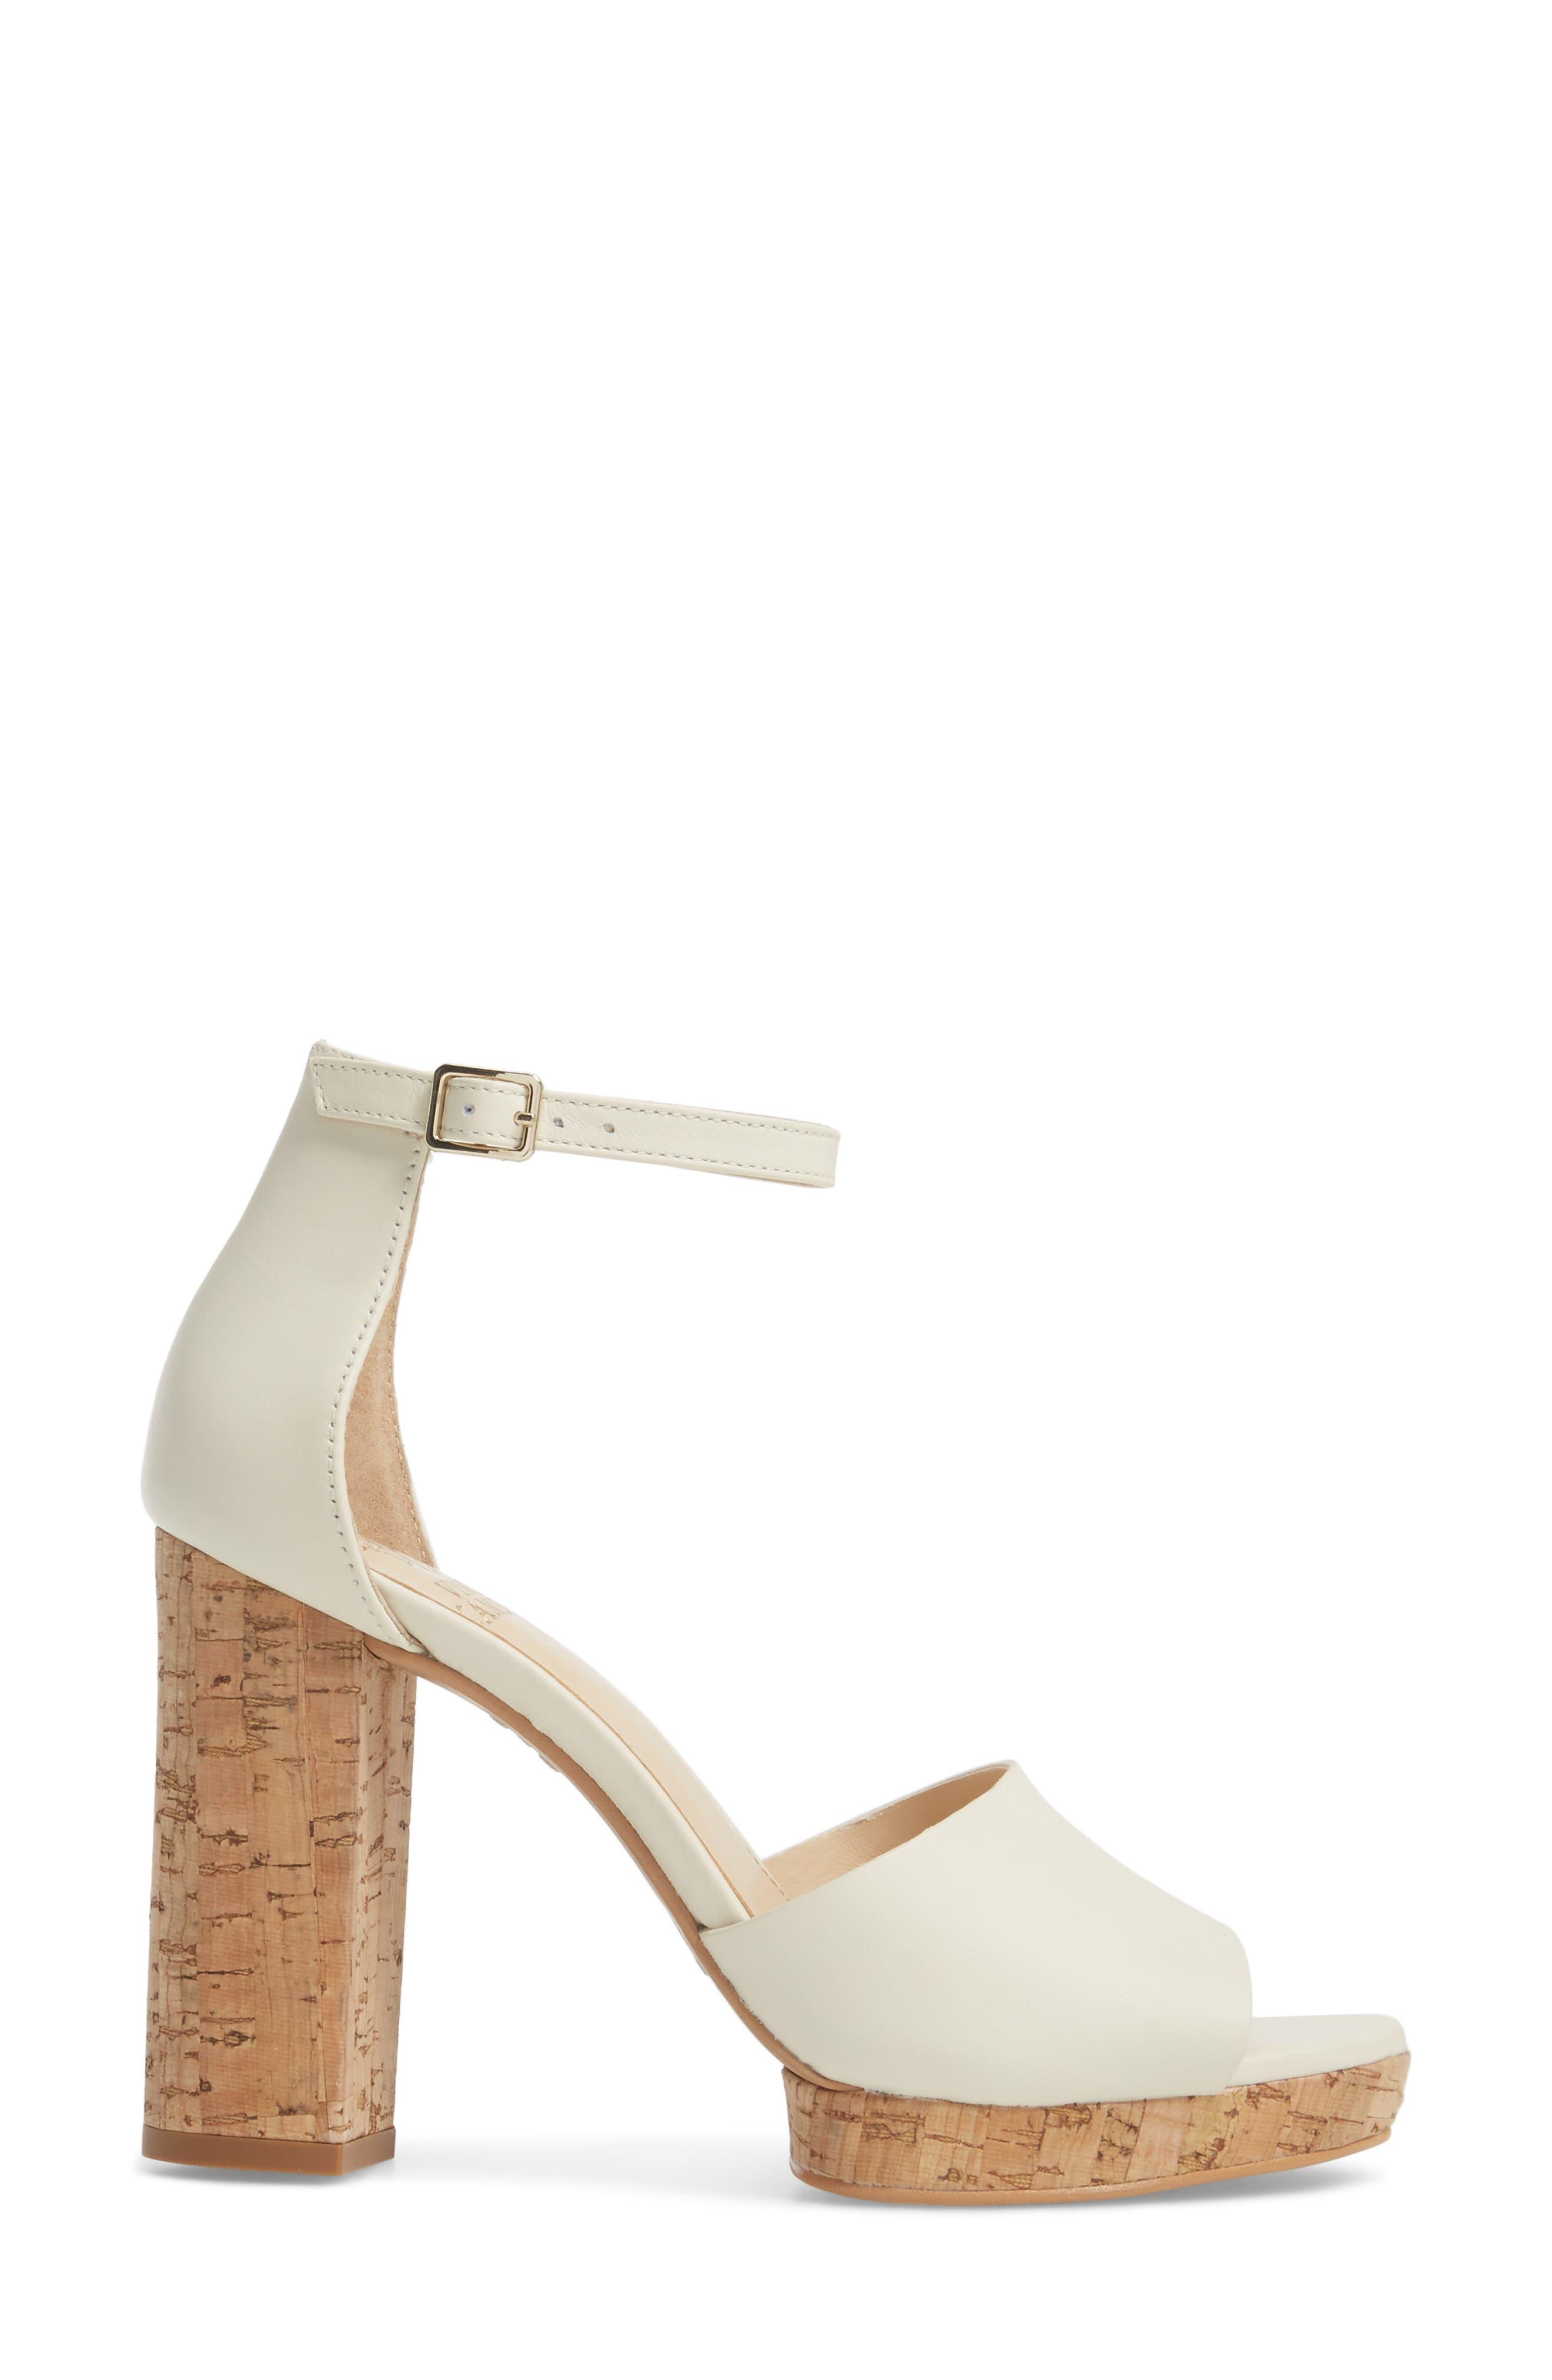 Ciestie Platform Sandal,                             Alternate thumbnail 3, color,                             Vanilla Leather